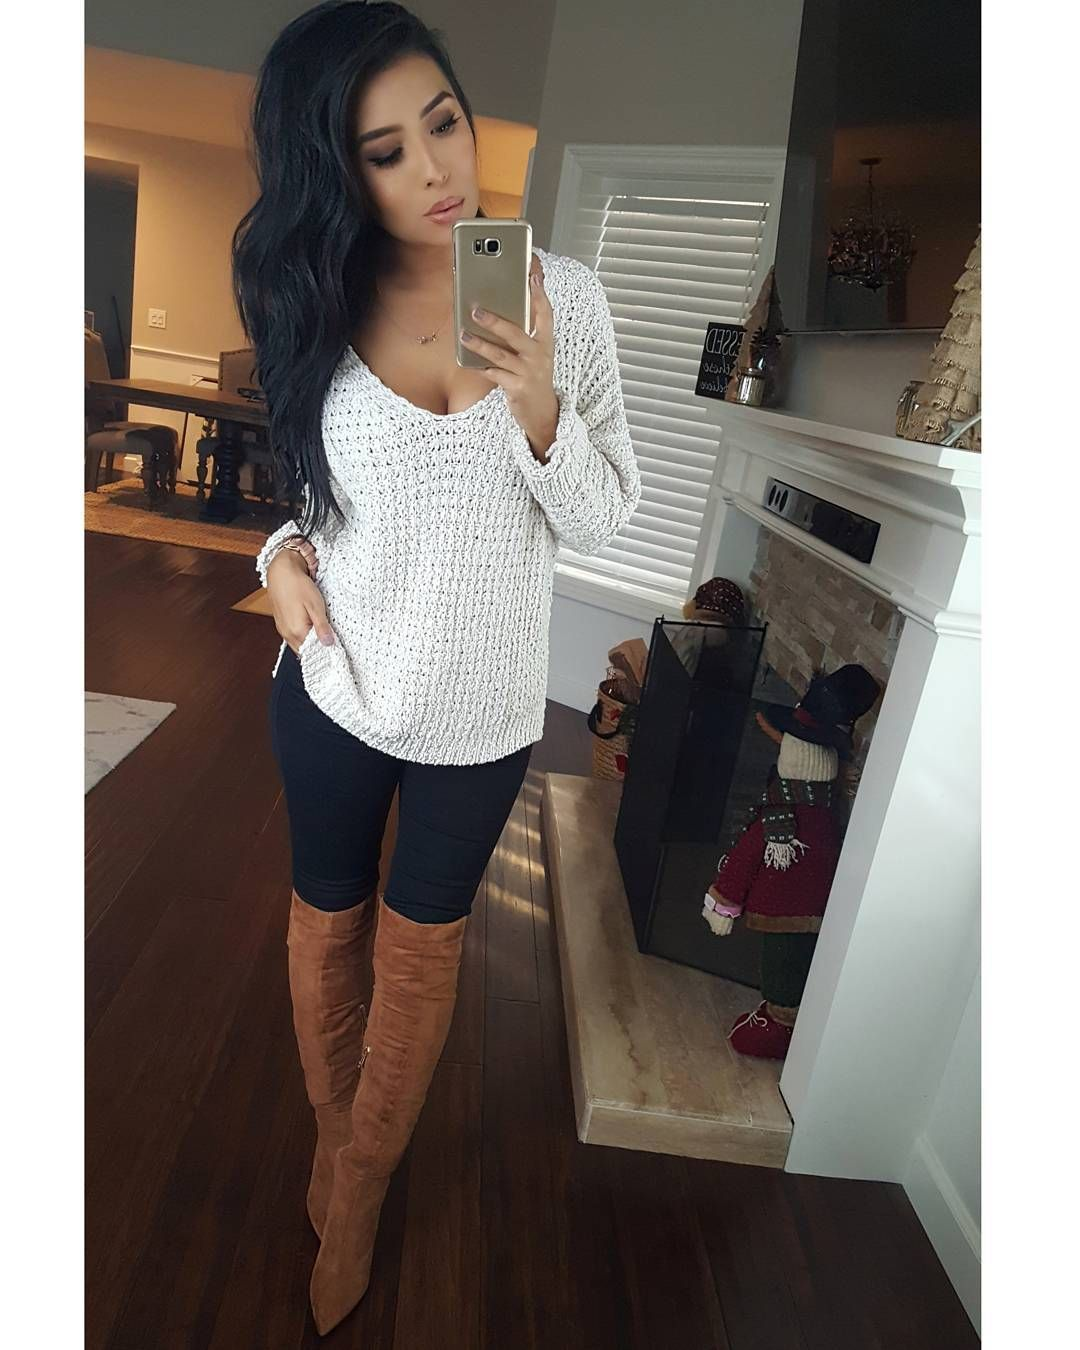 "Monica Gabriela • Influencer on Instagram: ""The prettiest sweater I ever did see 🤗❤ so soft & flattering 🙌 #ootd Sweater (daisy oversized sweater)@susyskloset  Jeans @fashionnova…"" 1"